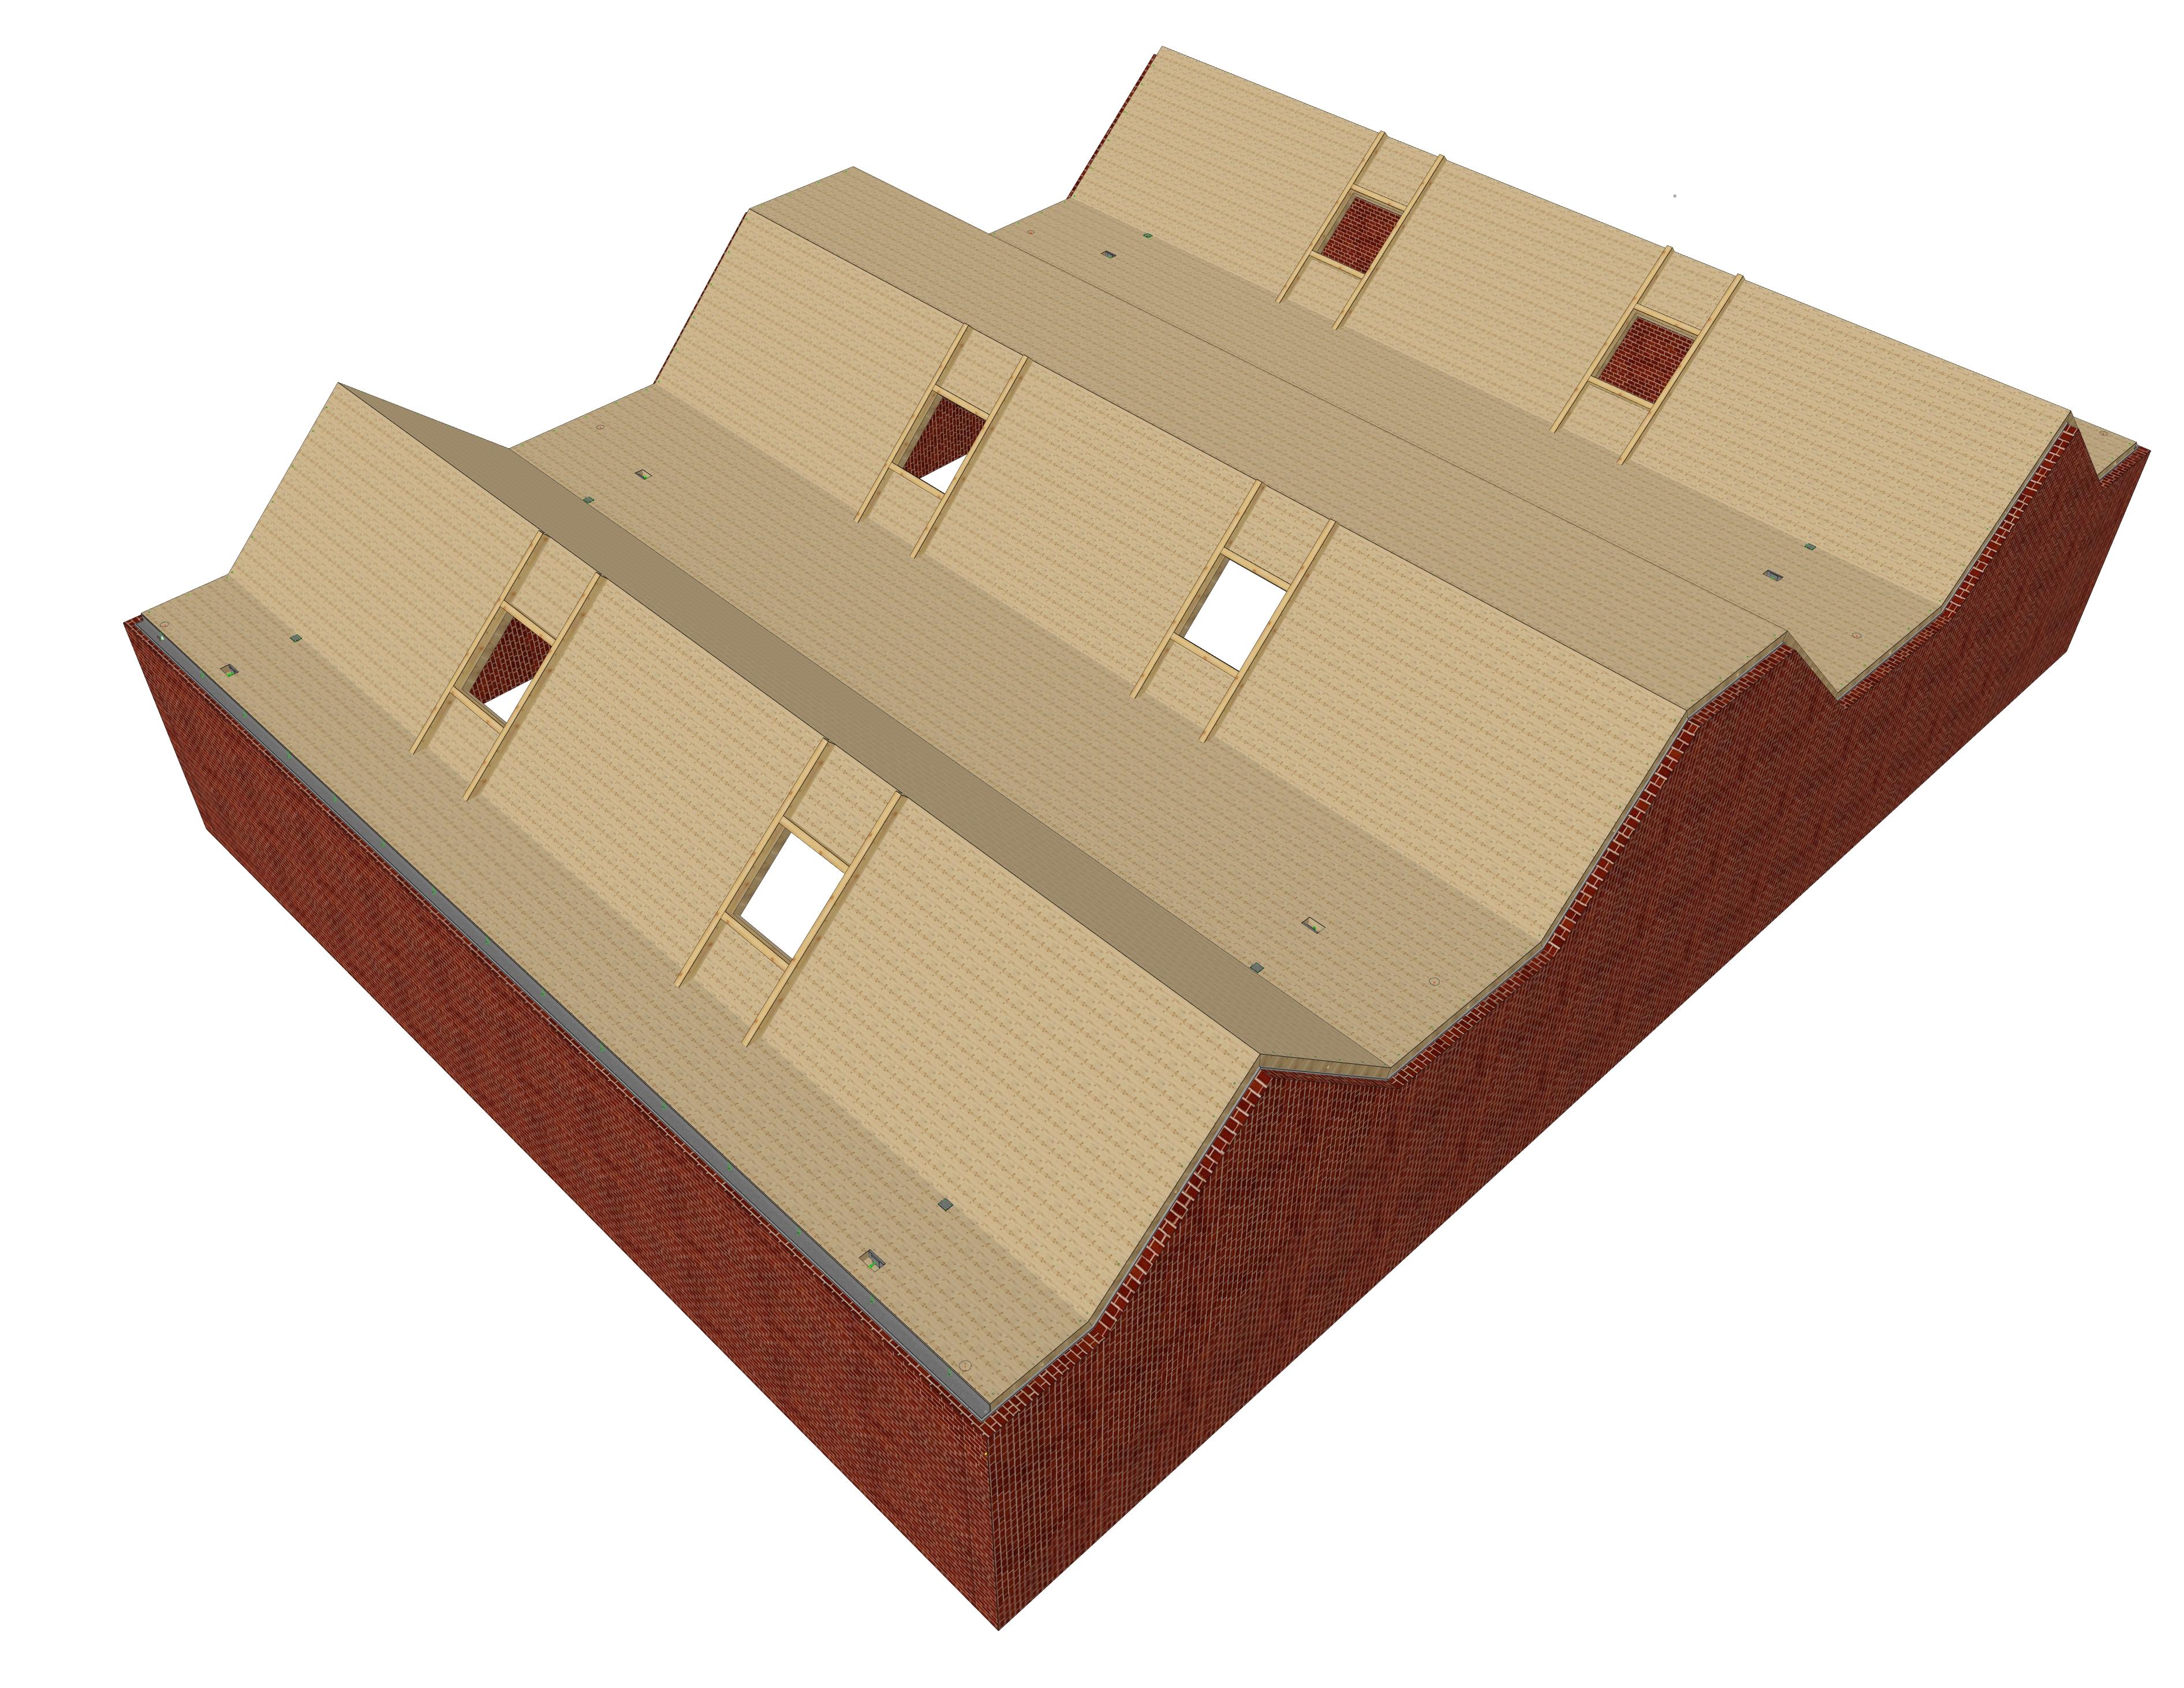 port sud moulart bureau d 39 tudes bois. Black Bedroom Furniture Sets. Home Design Ideas